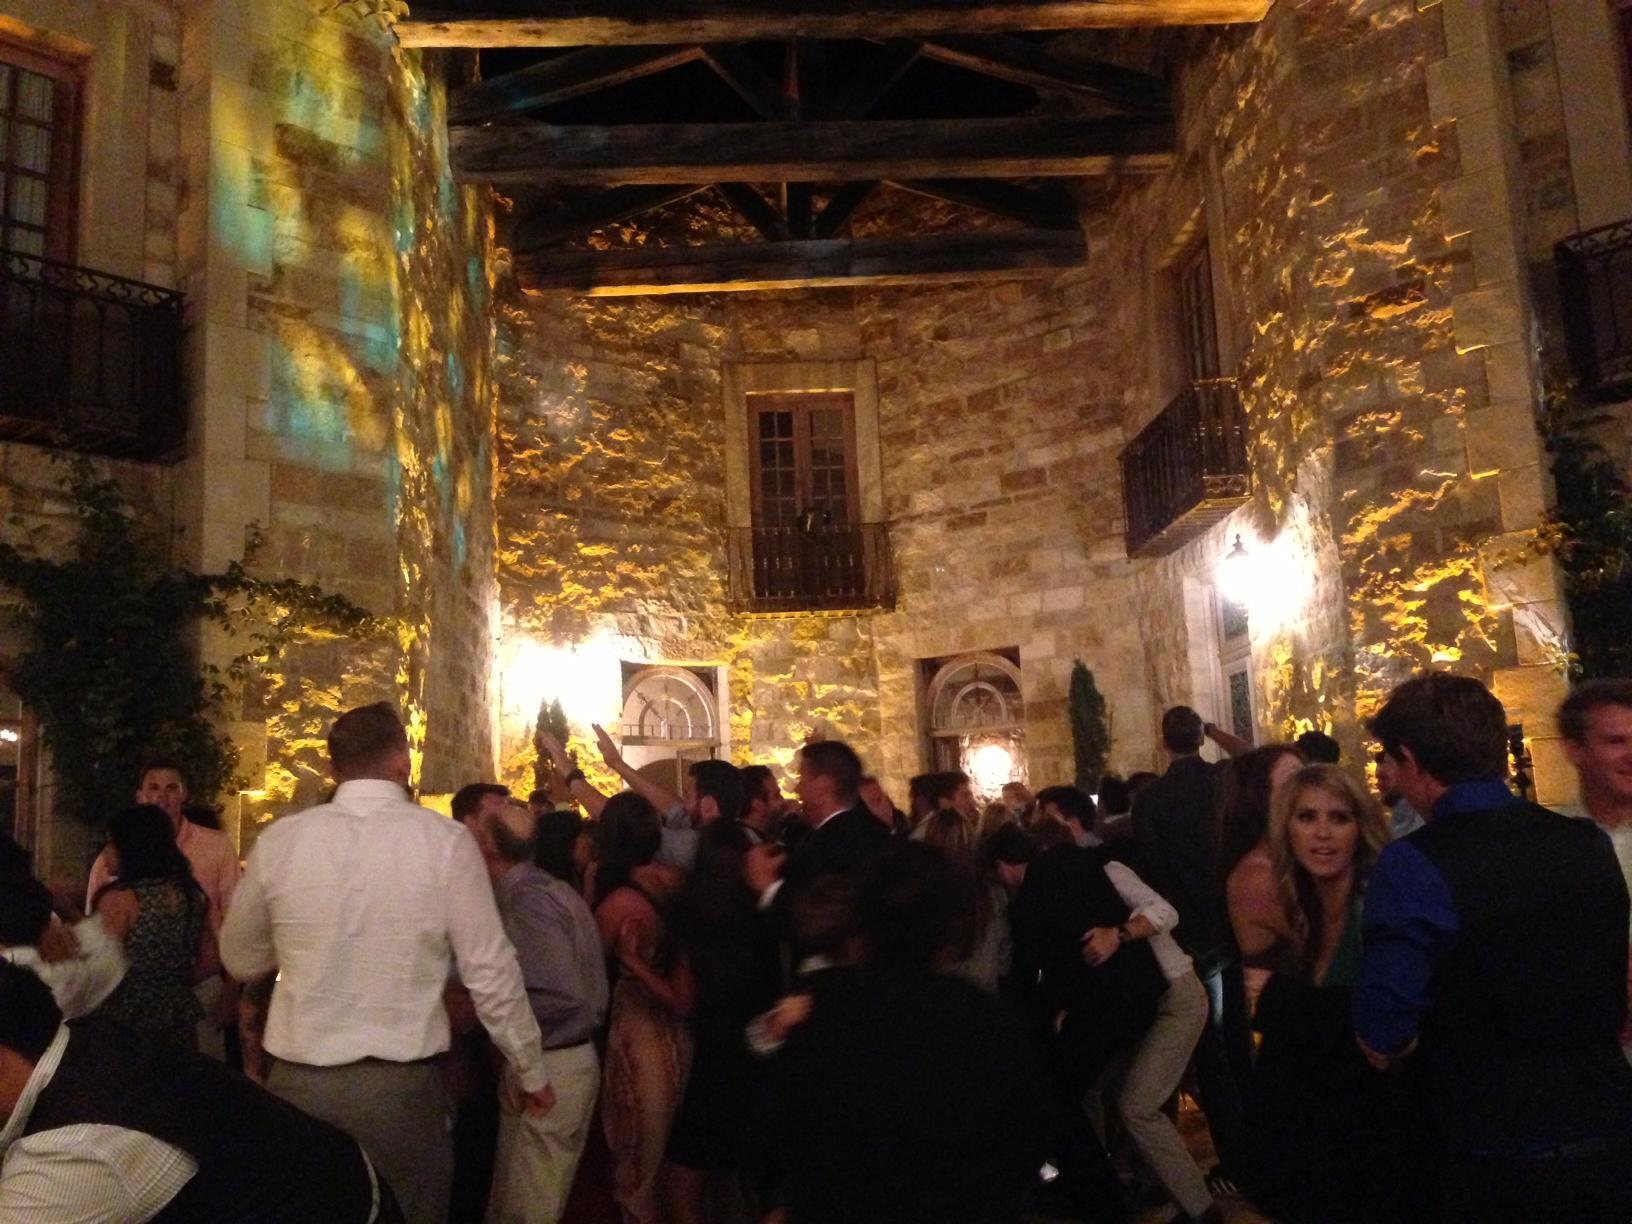 Santa Barbara Wedding DJs Event Lighting : Full lighting design house, uplighting, lighting design, professional lighting